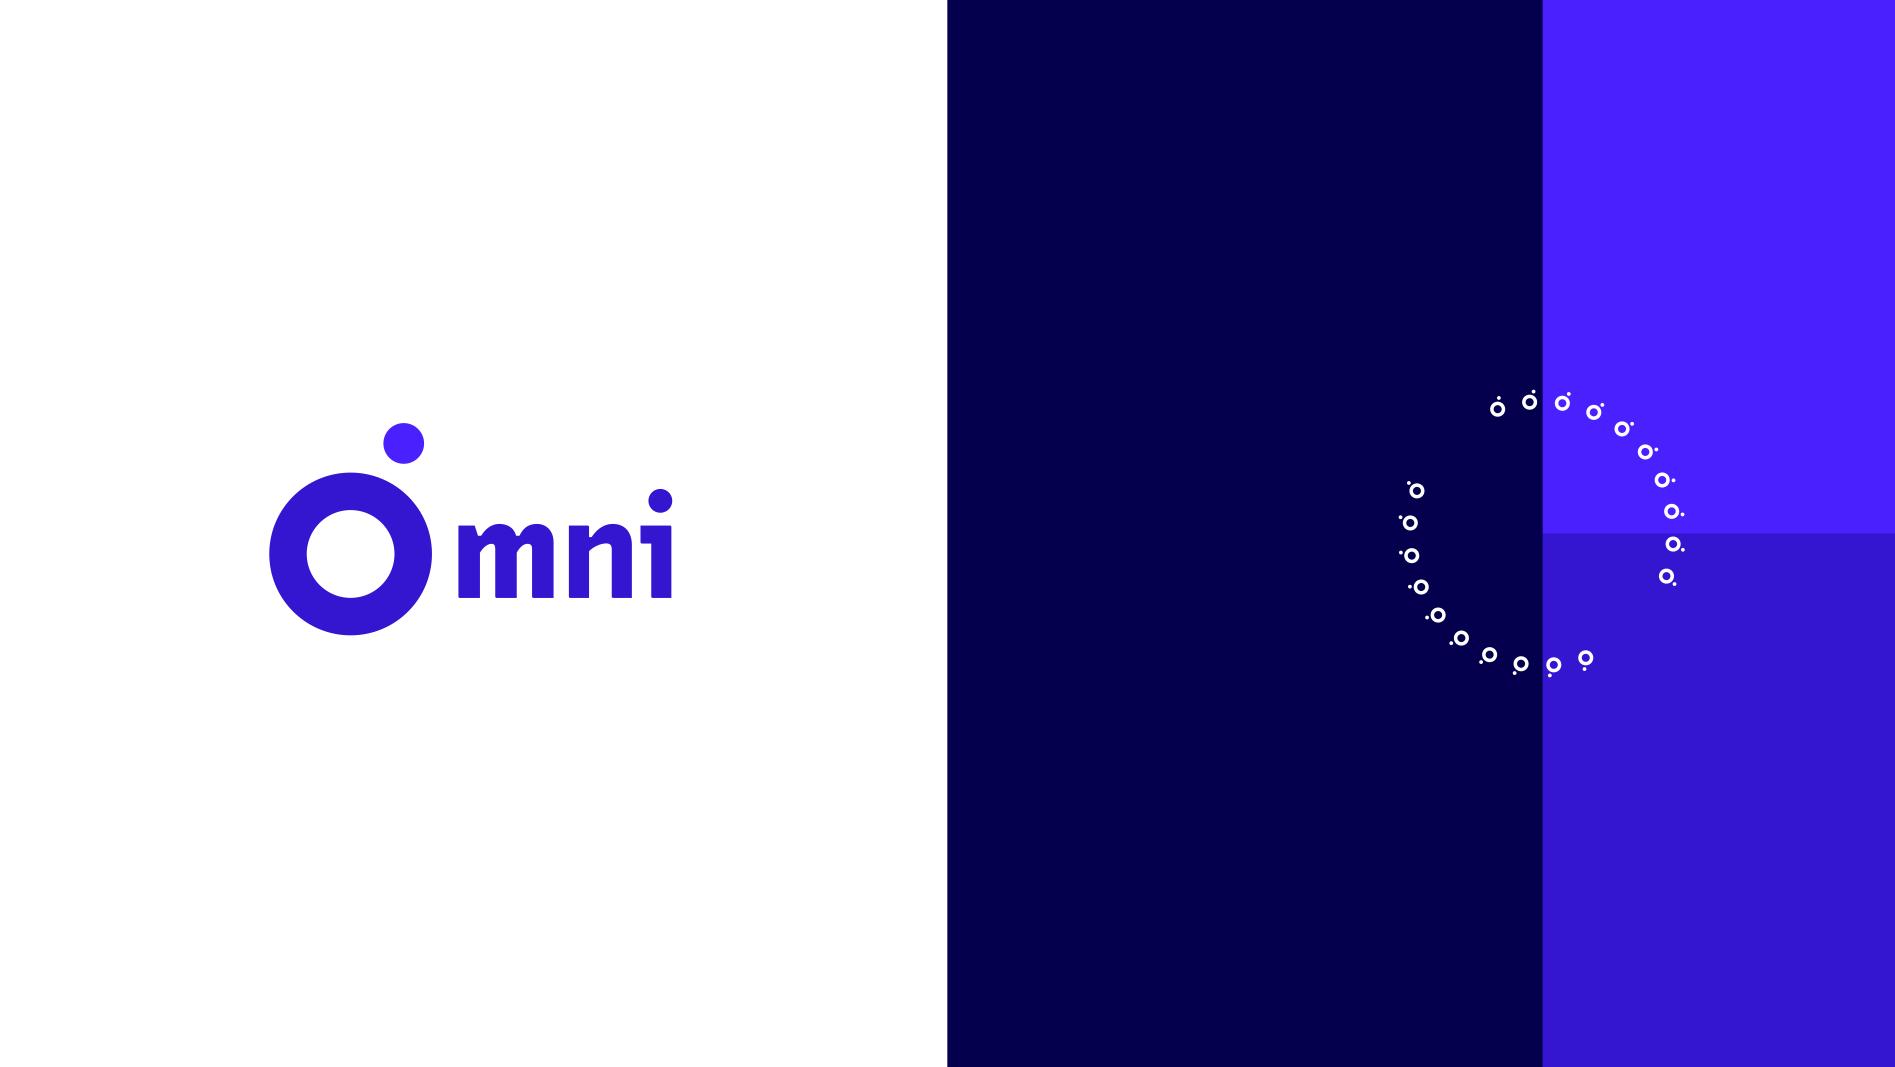 blue-iguana-media-projects-1500